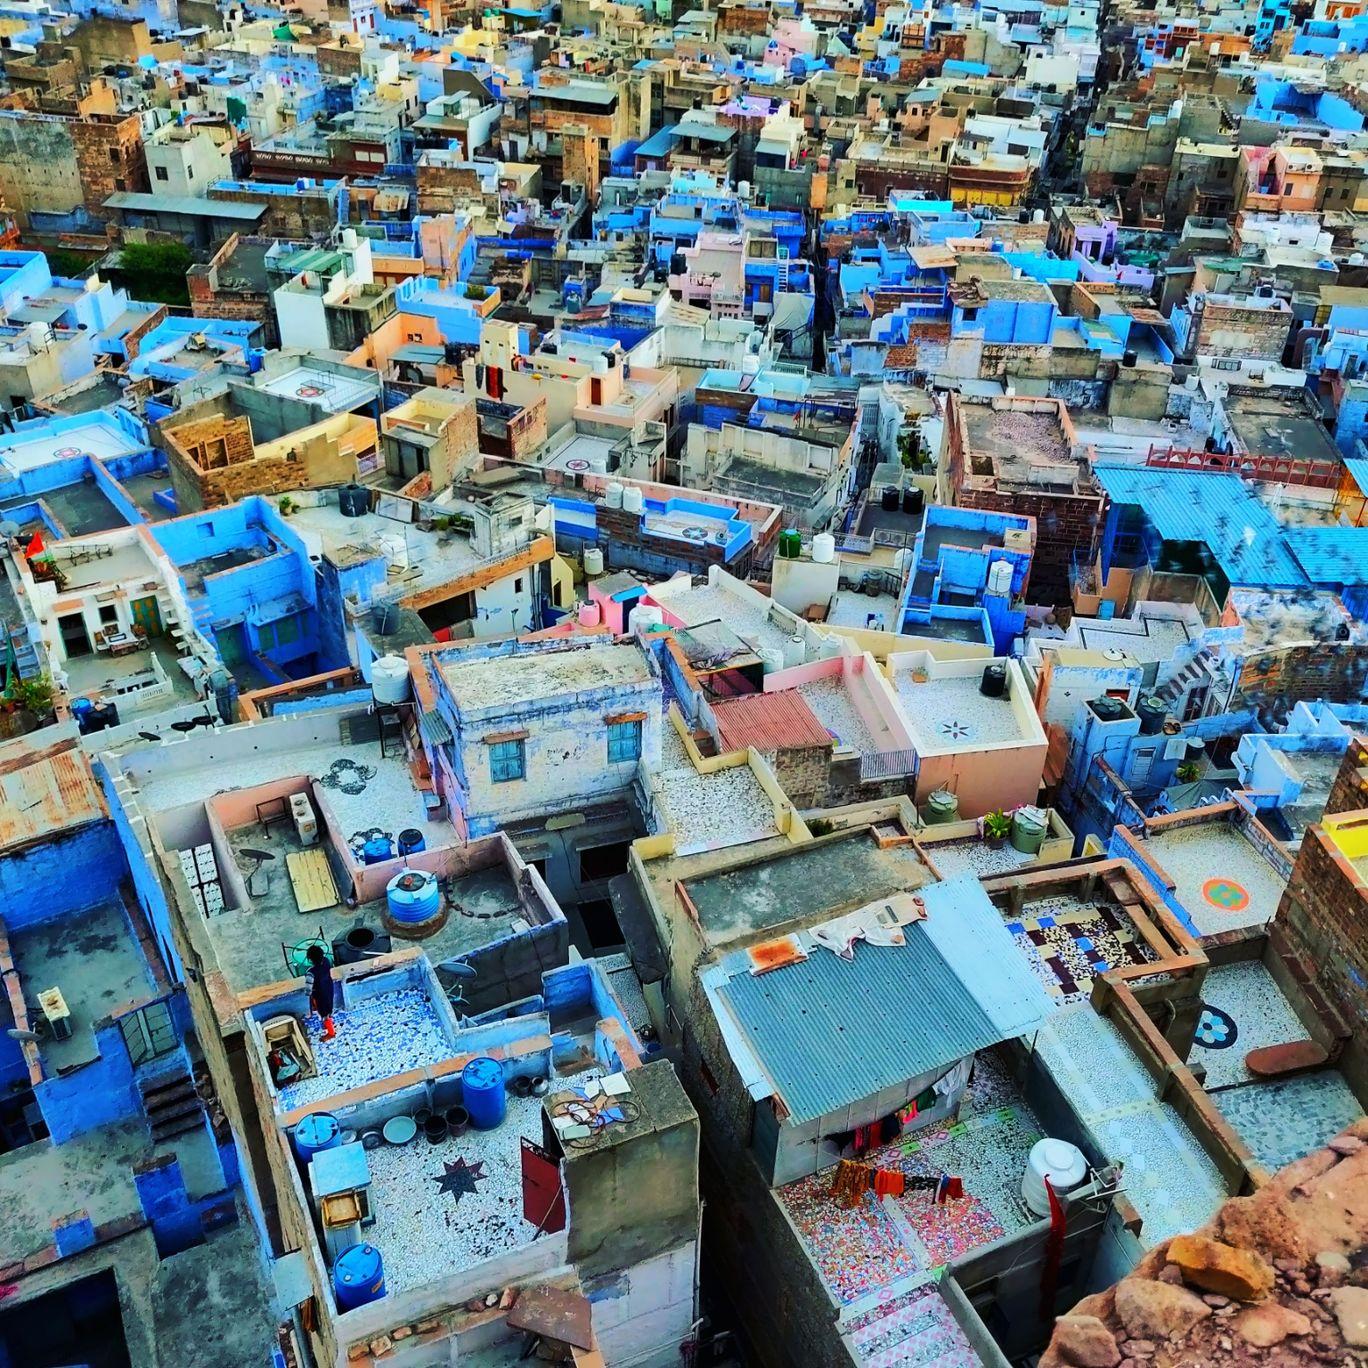 Photo of Pachetia Hill By Shubham V Raut